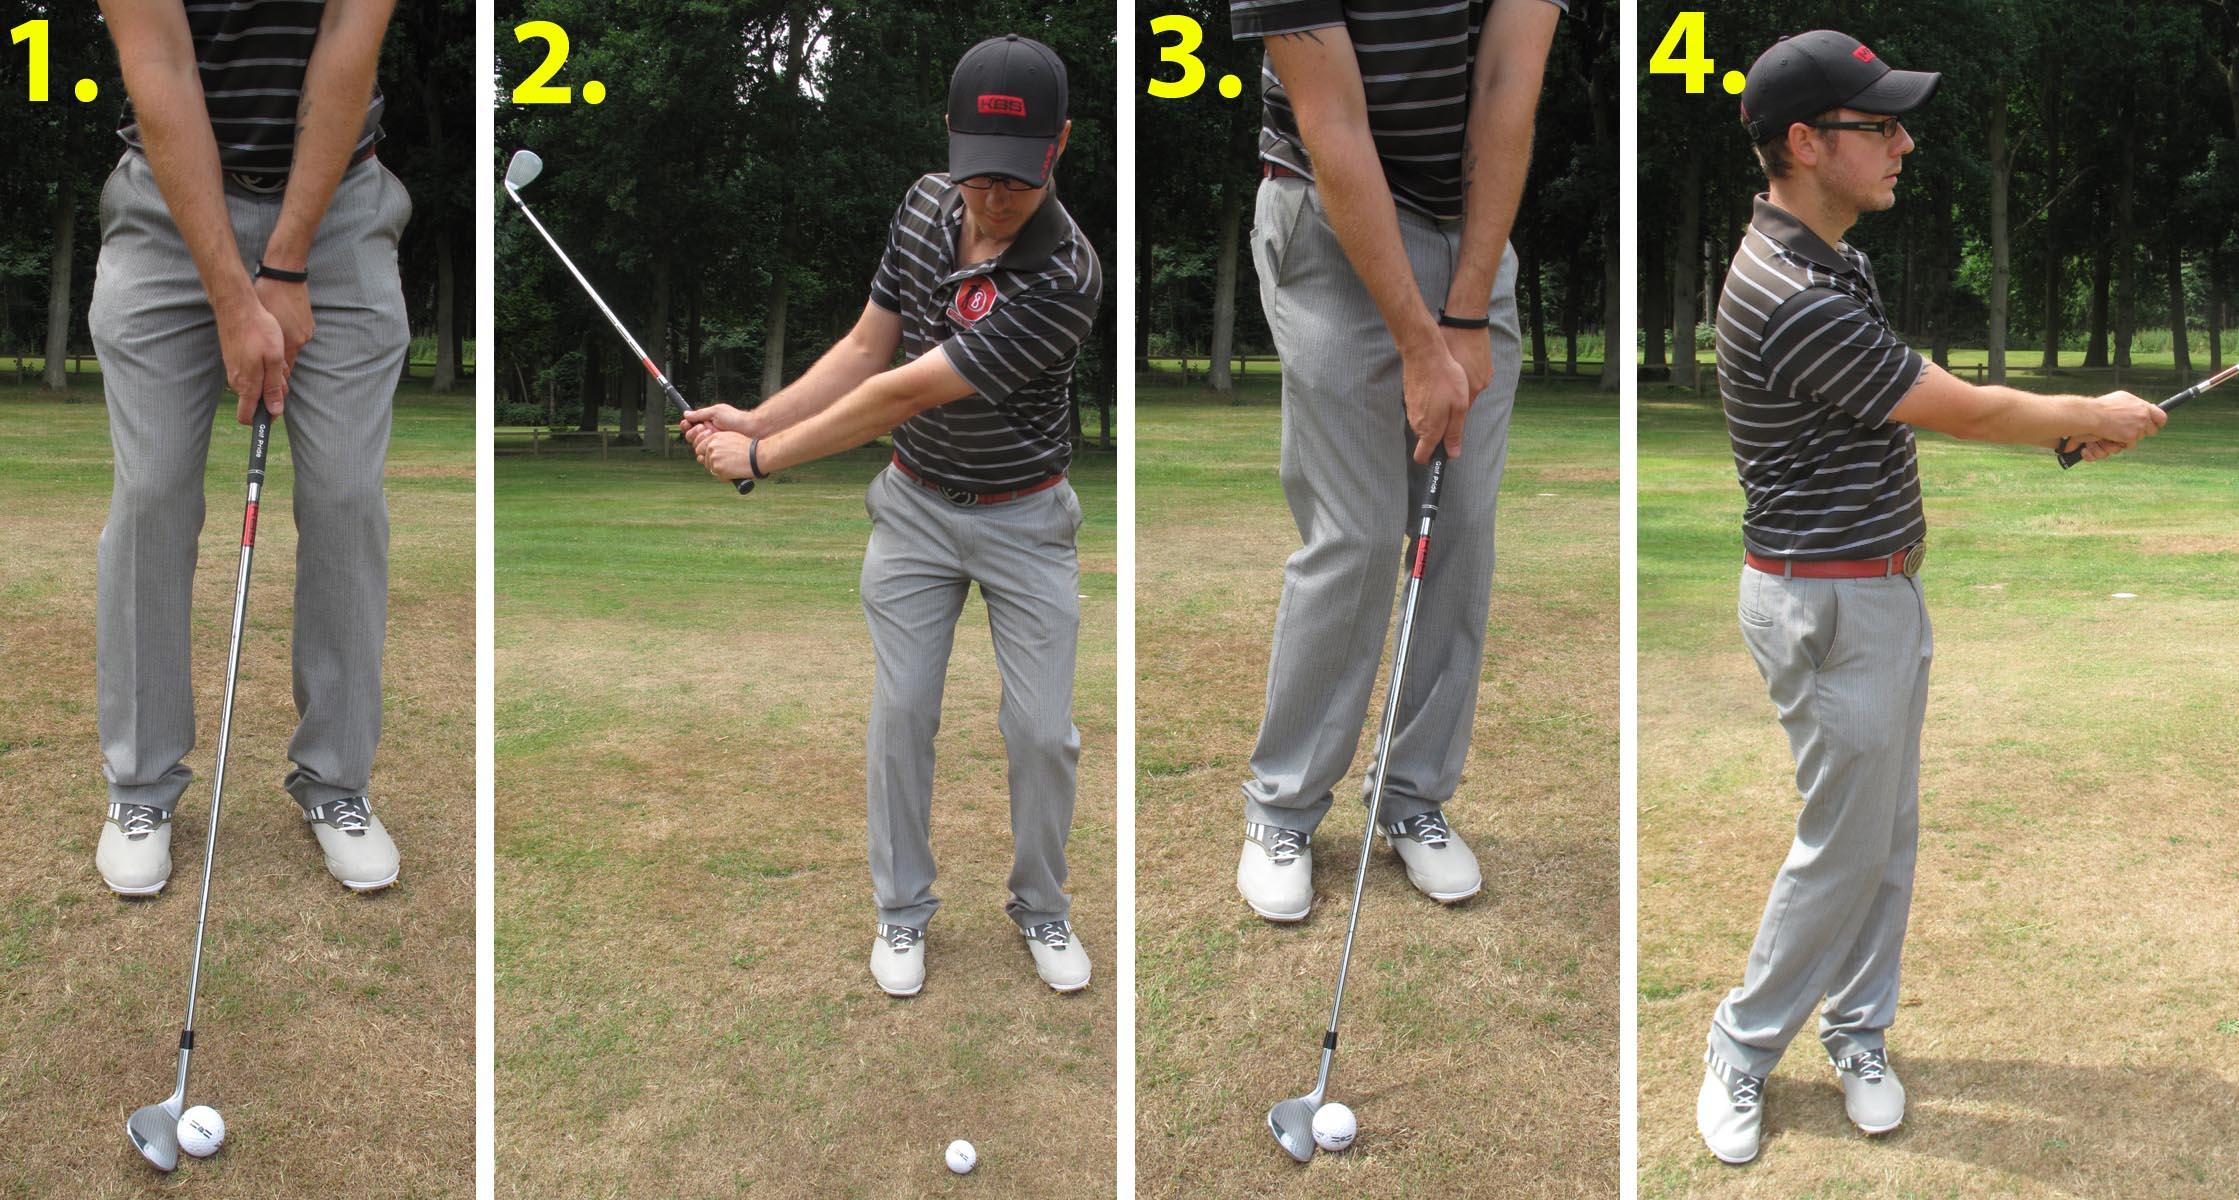 1. address, 2. backswing, 3. Impact, 4. follow-through. Each stage is key to hitting off hardpan